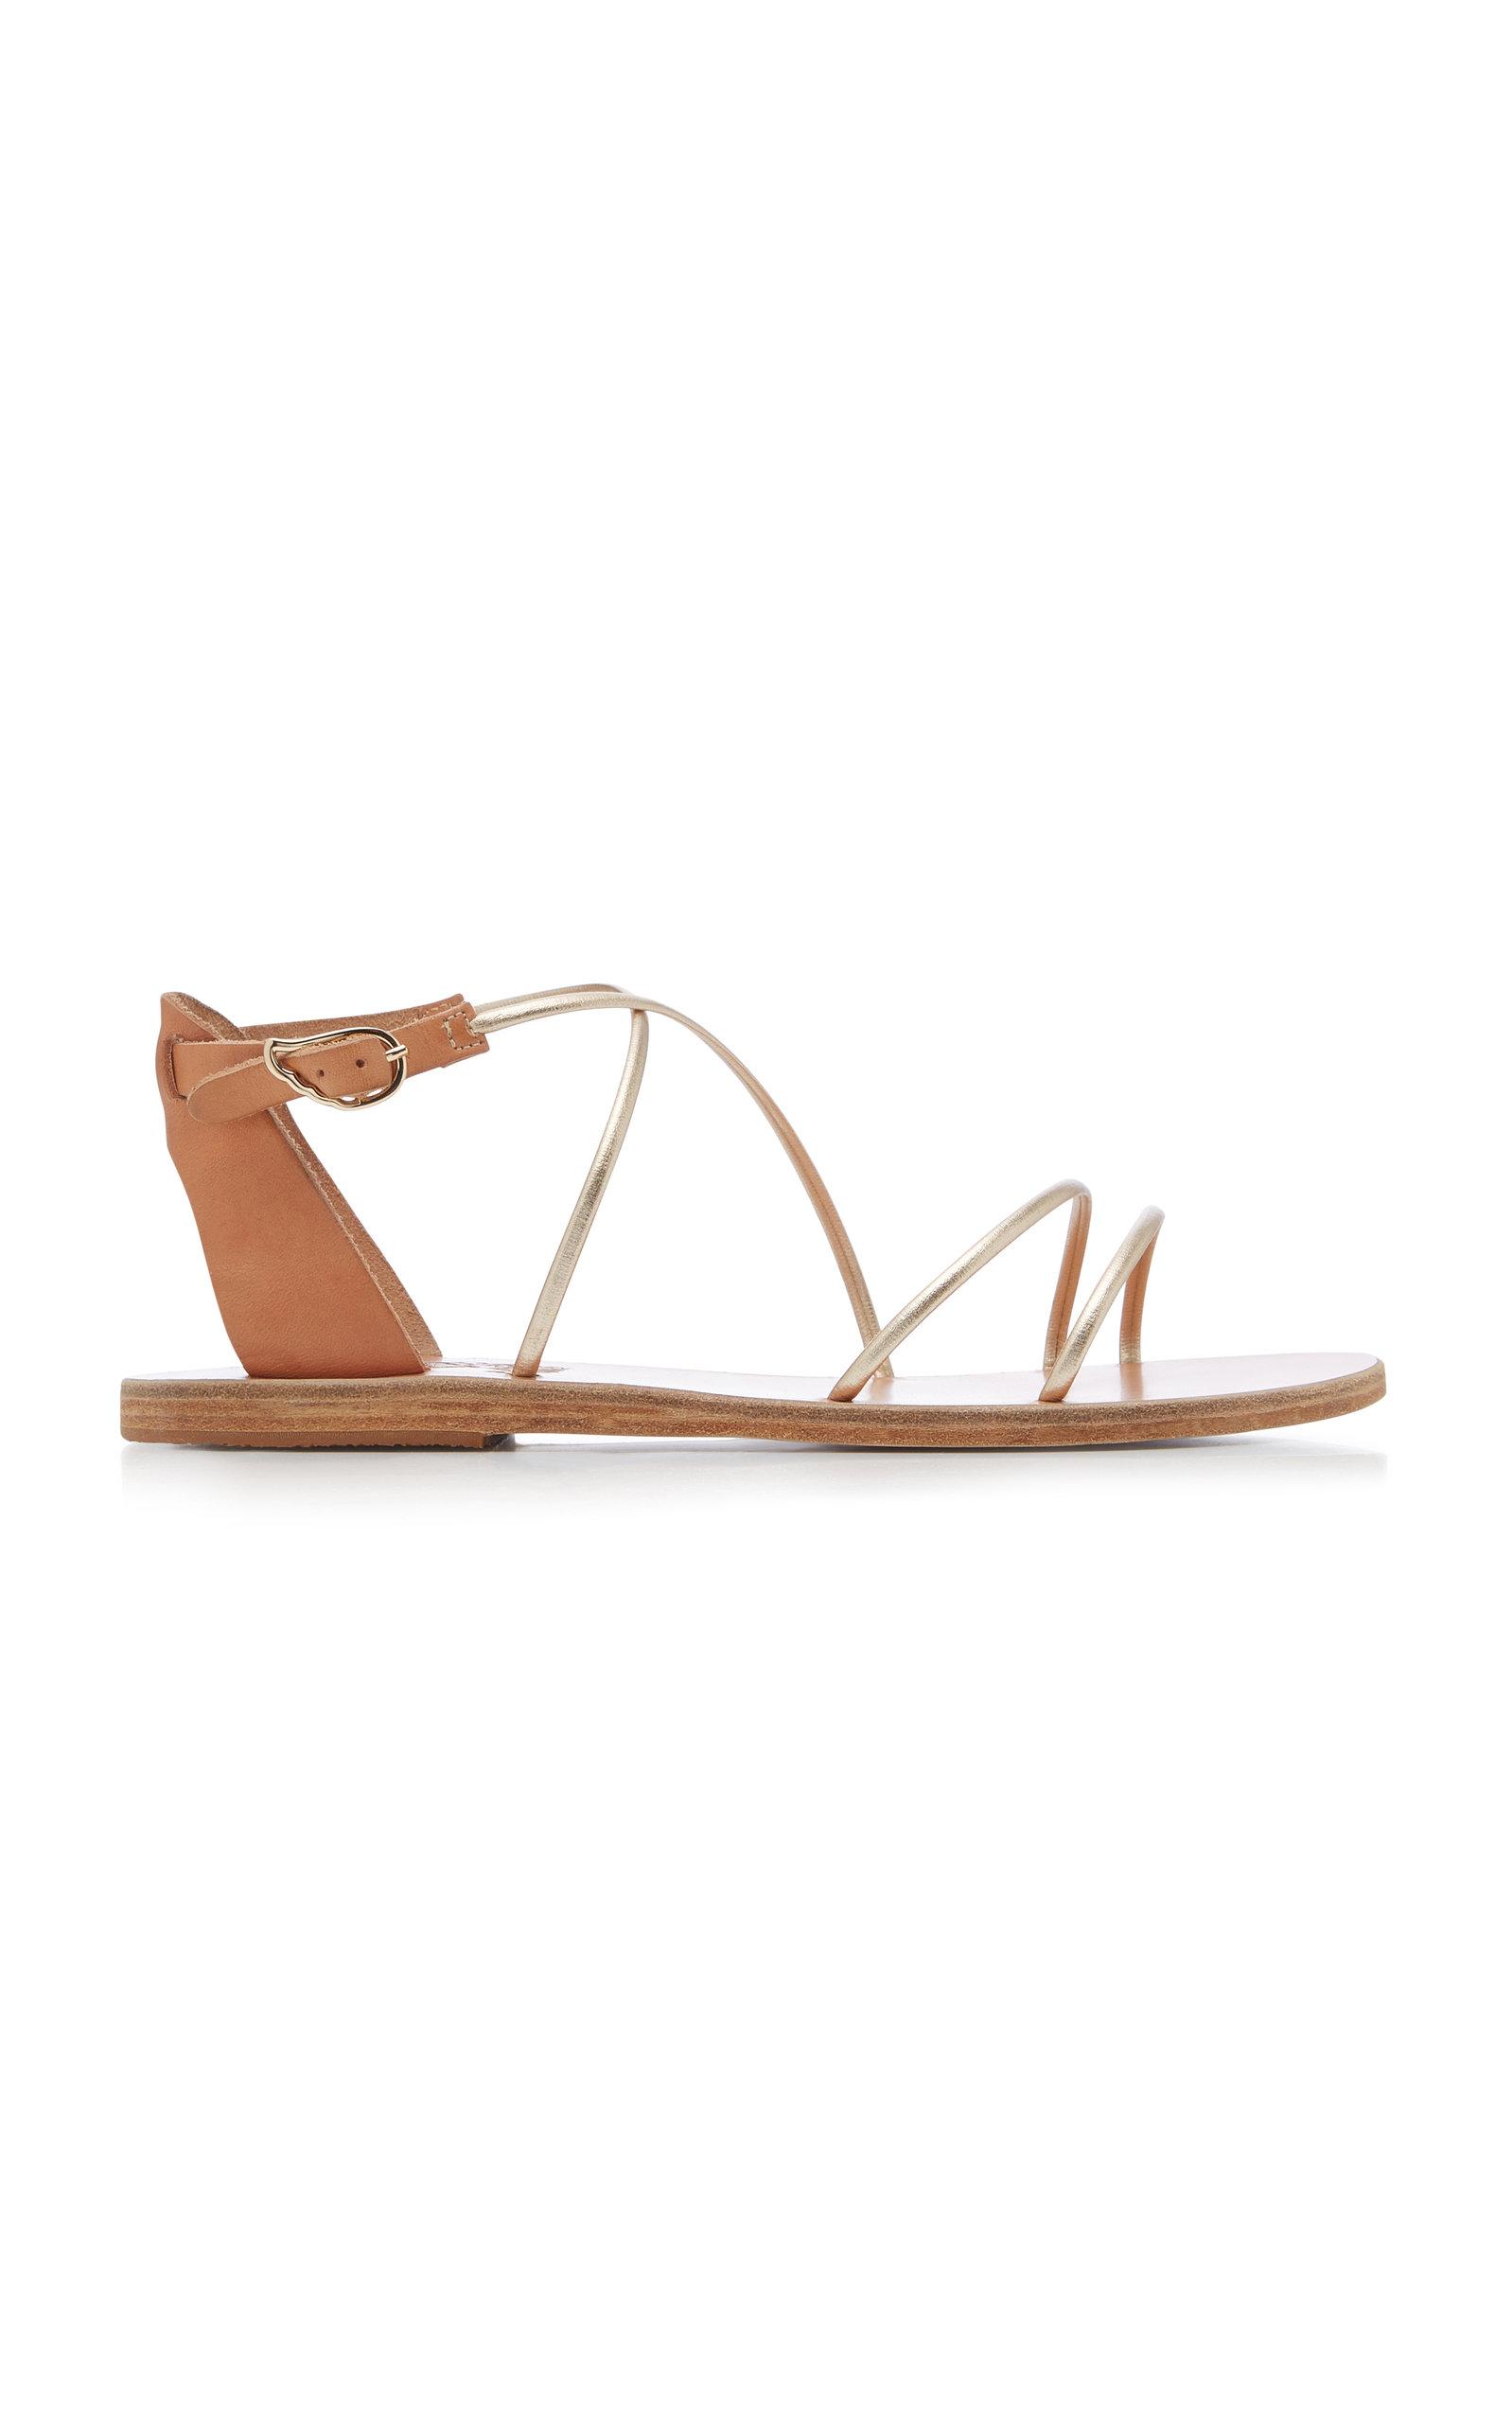 762c9f6f2 Ancient Greek SandalsMeloivia Leather Sandals. CLOSE. Loading